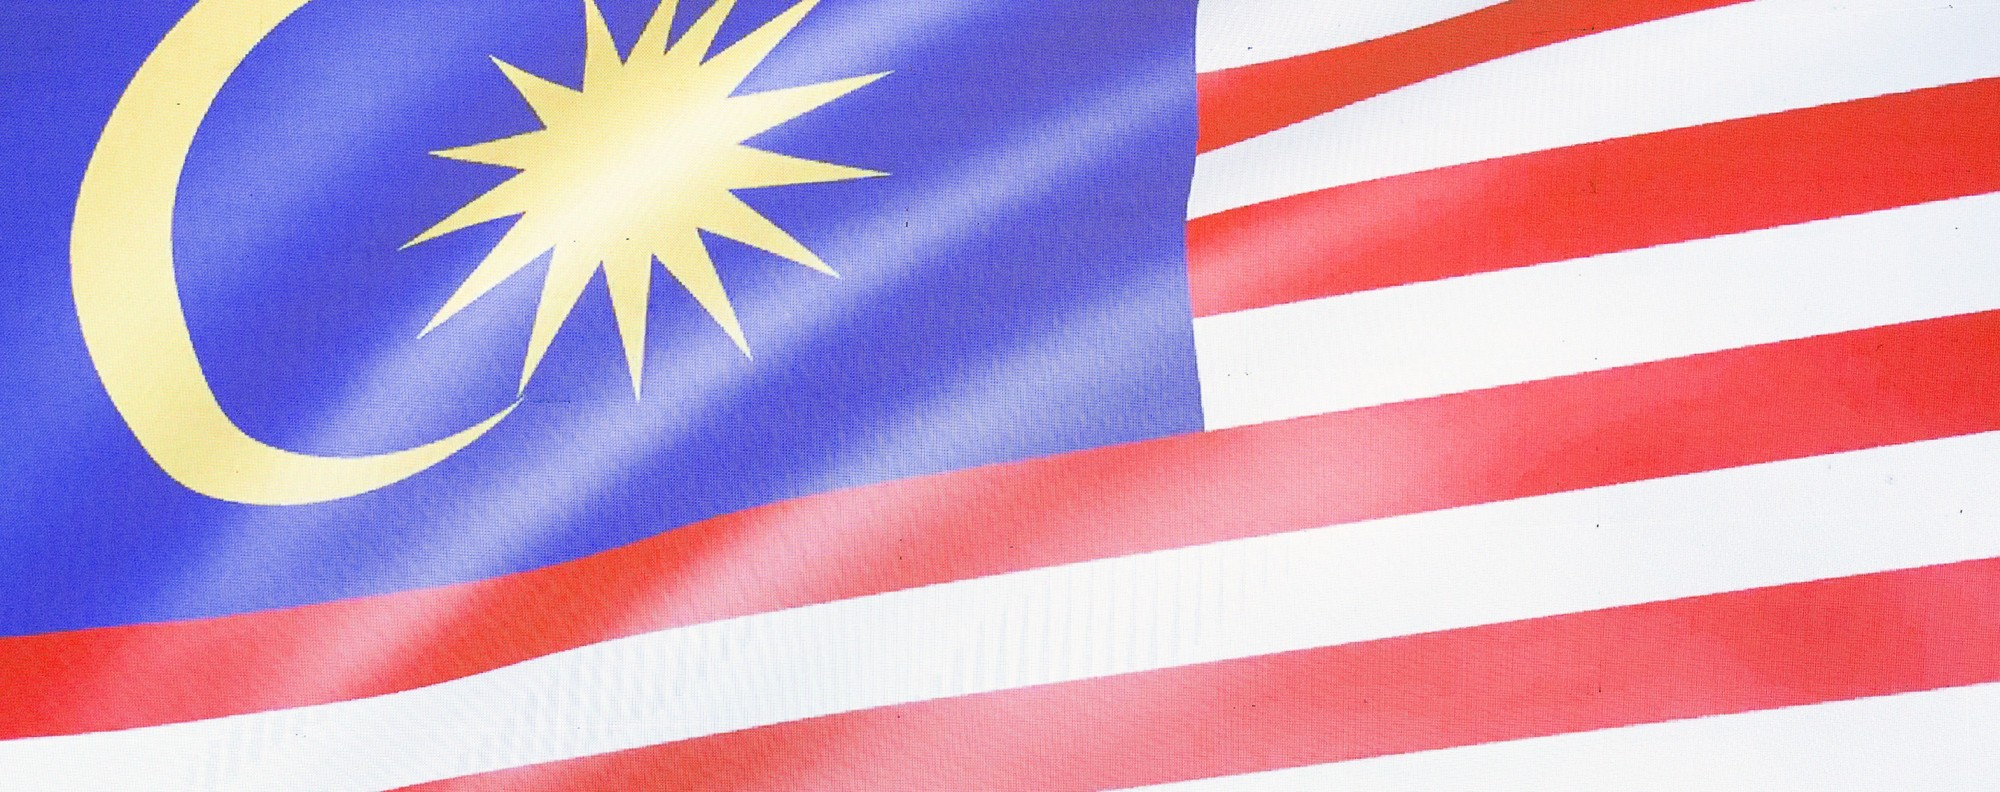 Malaysian flag. Photo: Bloomberg